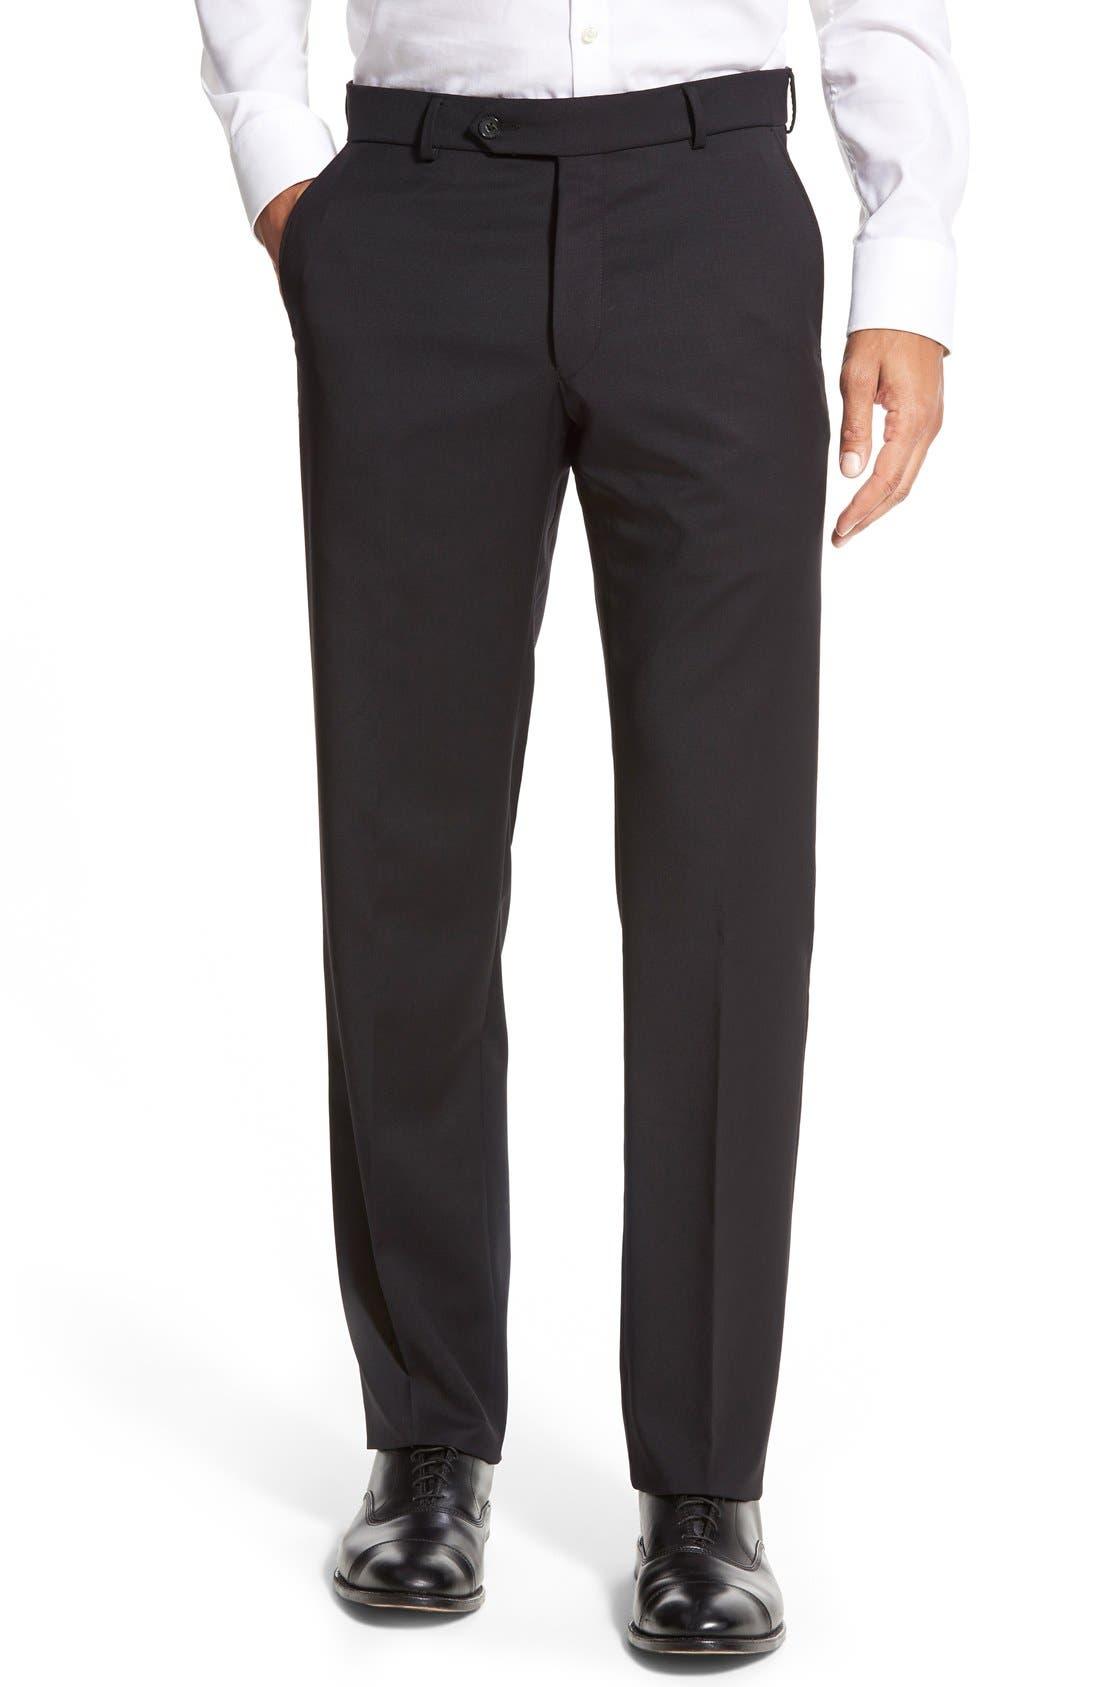 BALLIN Flat Front Solid Wool Trousers in Black